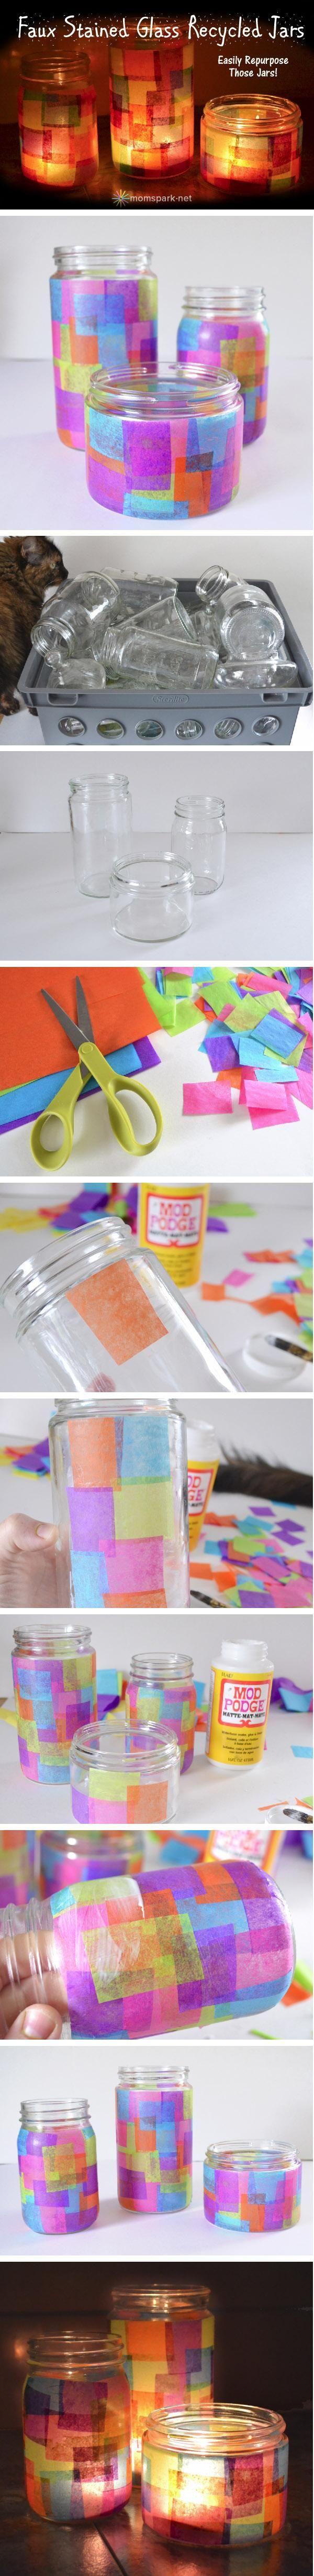 tarros-vidrio-1-colores-diy-muy-ingenioso